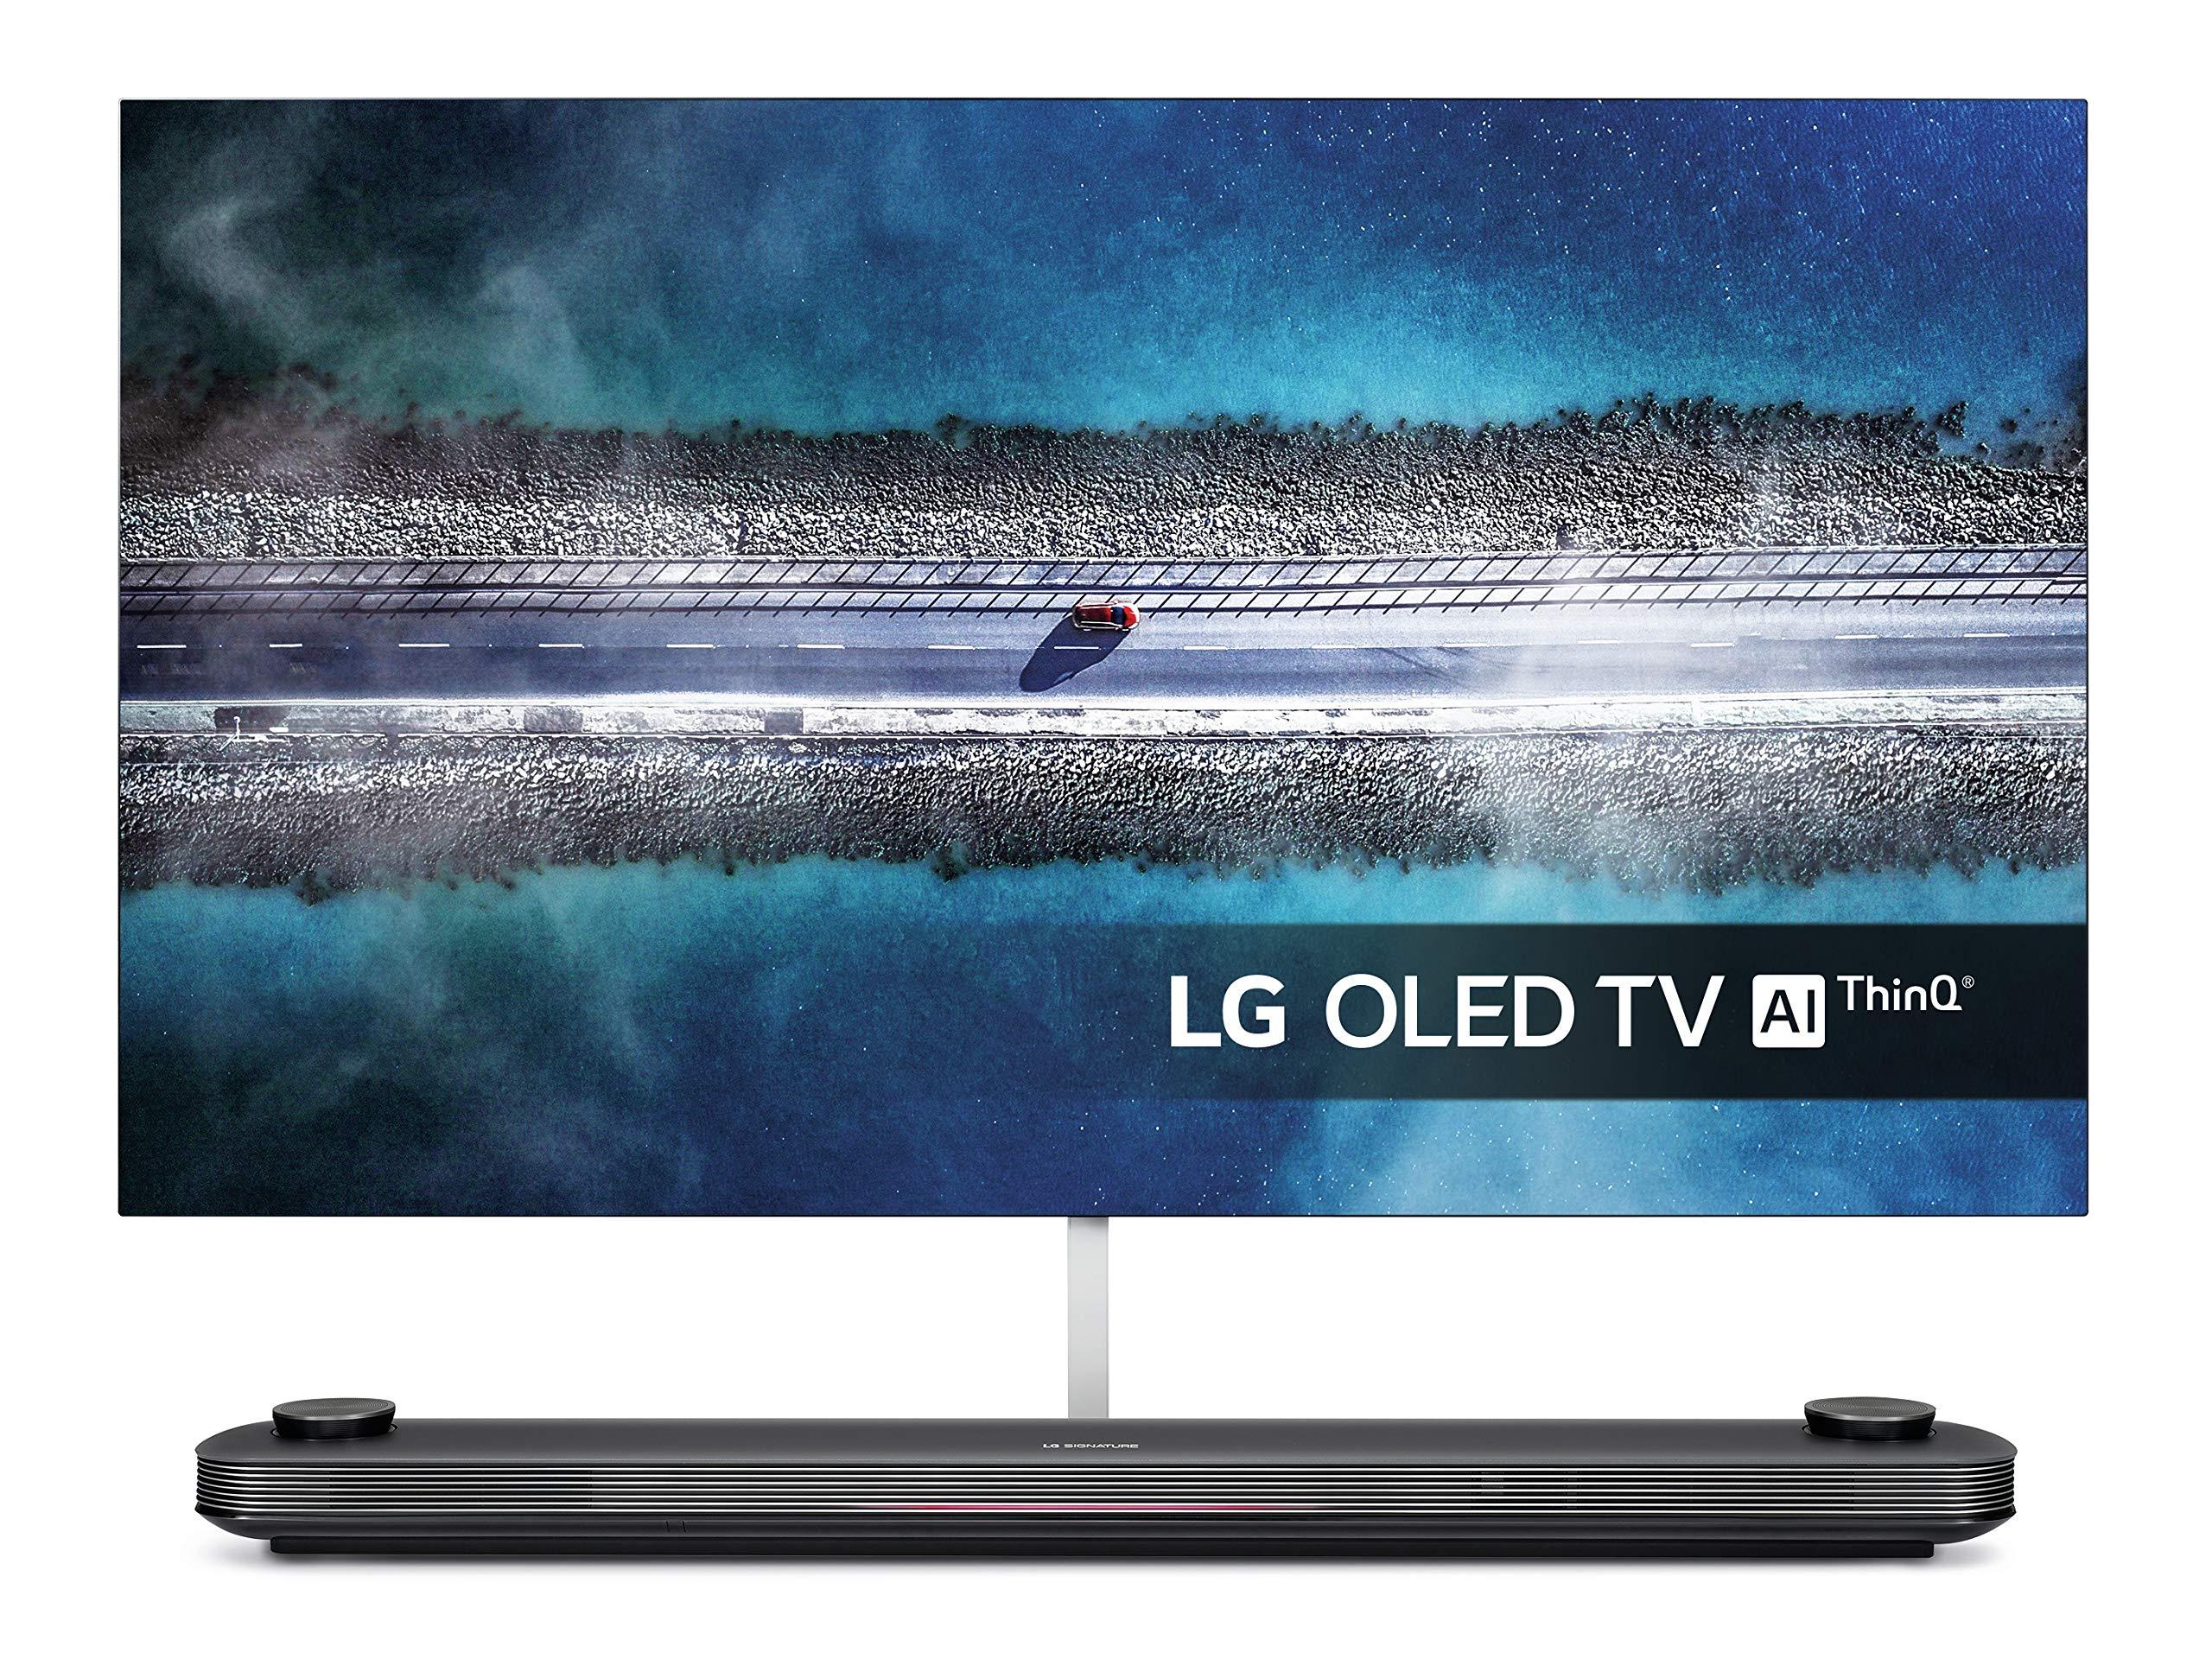 LG - TV OLED 195 Cm (77)  Lg Oled77W9 4K, HDR Smart TV con Inteligencia Artificial (IA): Amazon.es: Electrónica